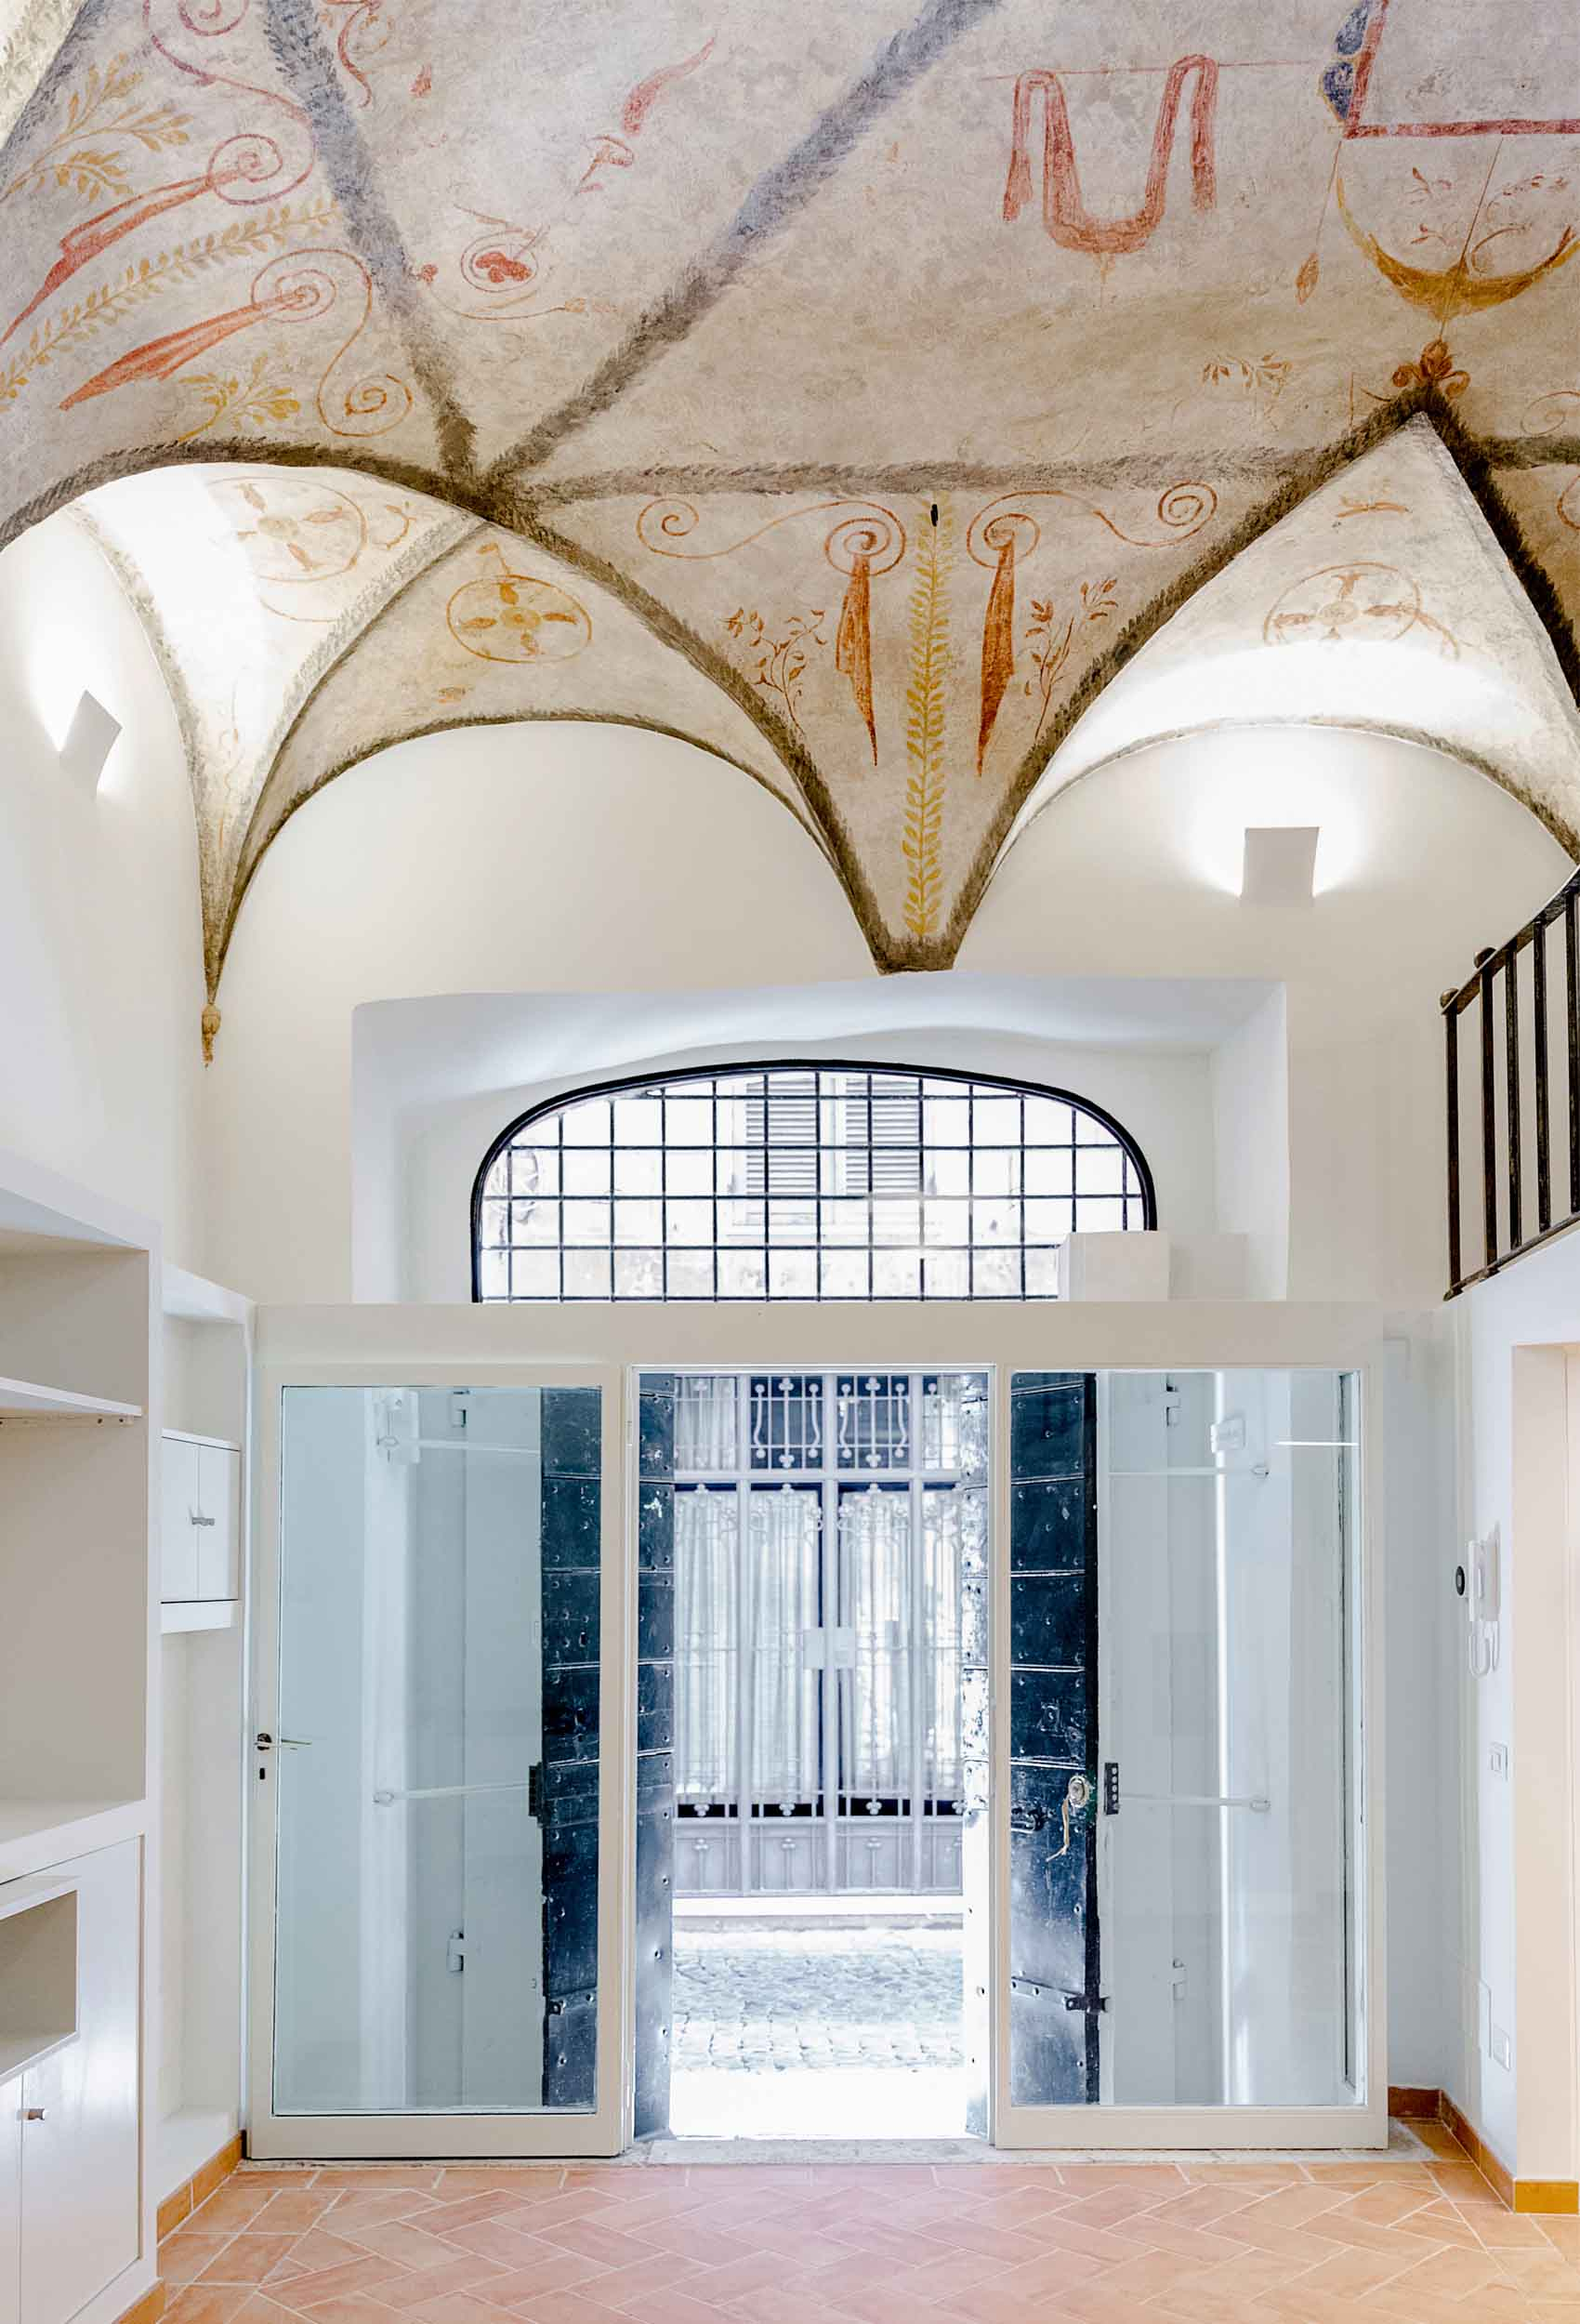 restauro-architettonico-roma12